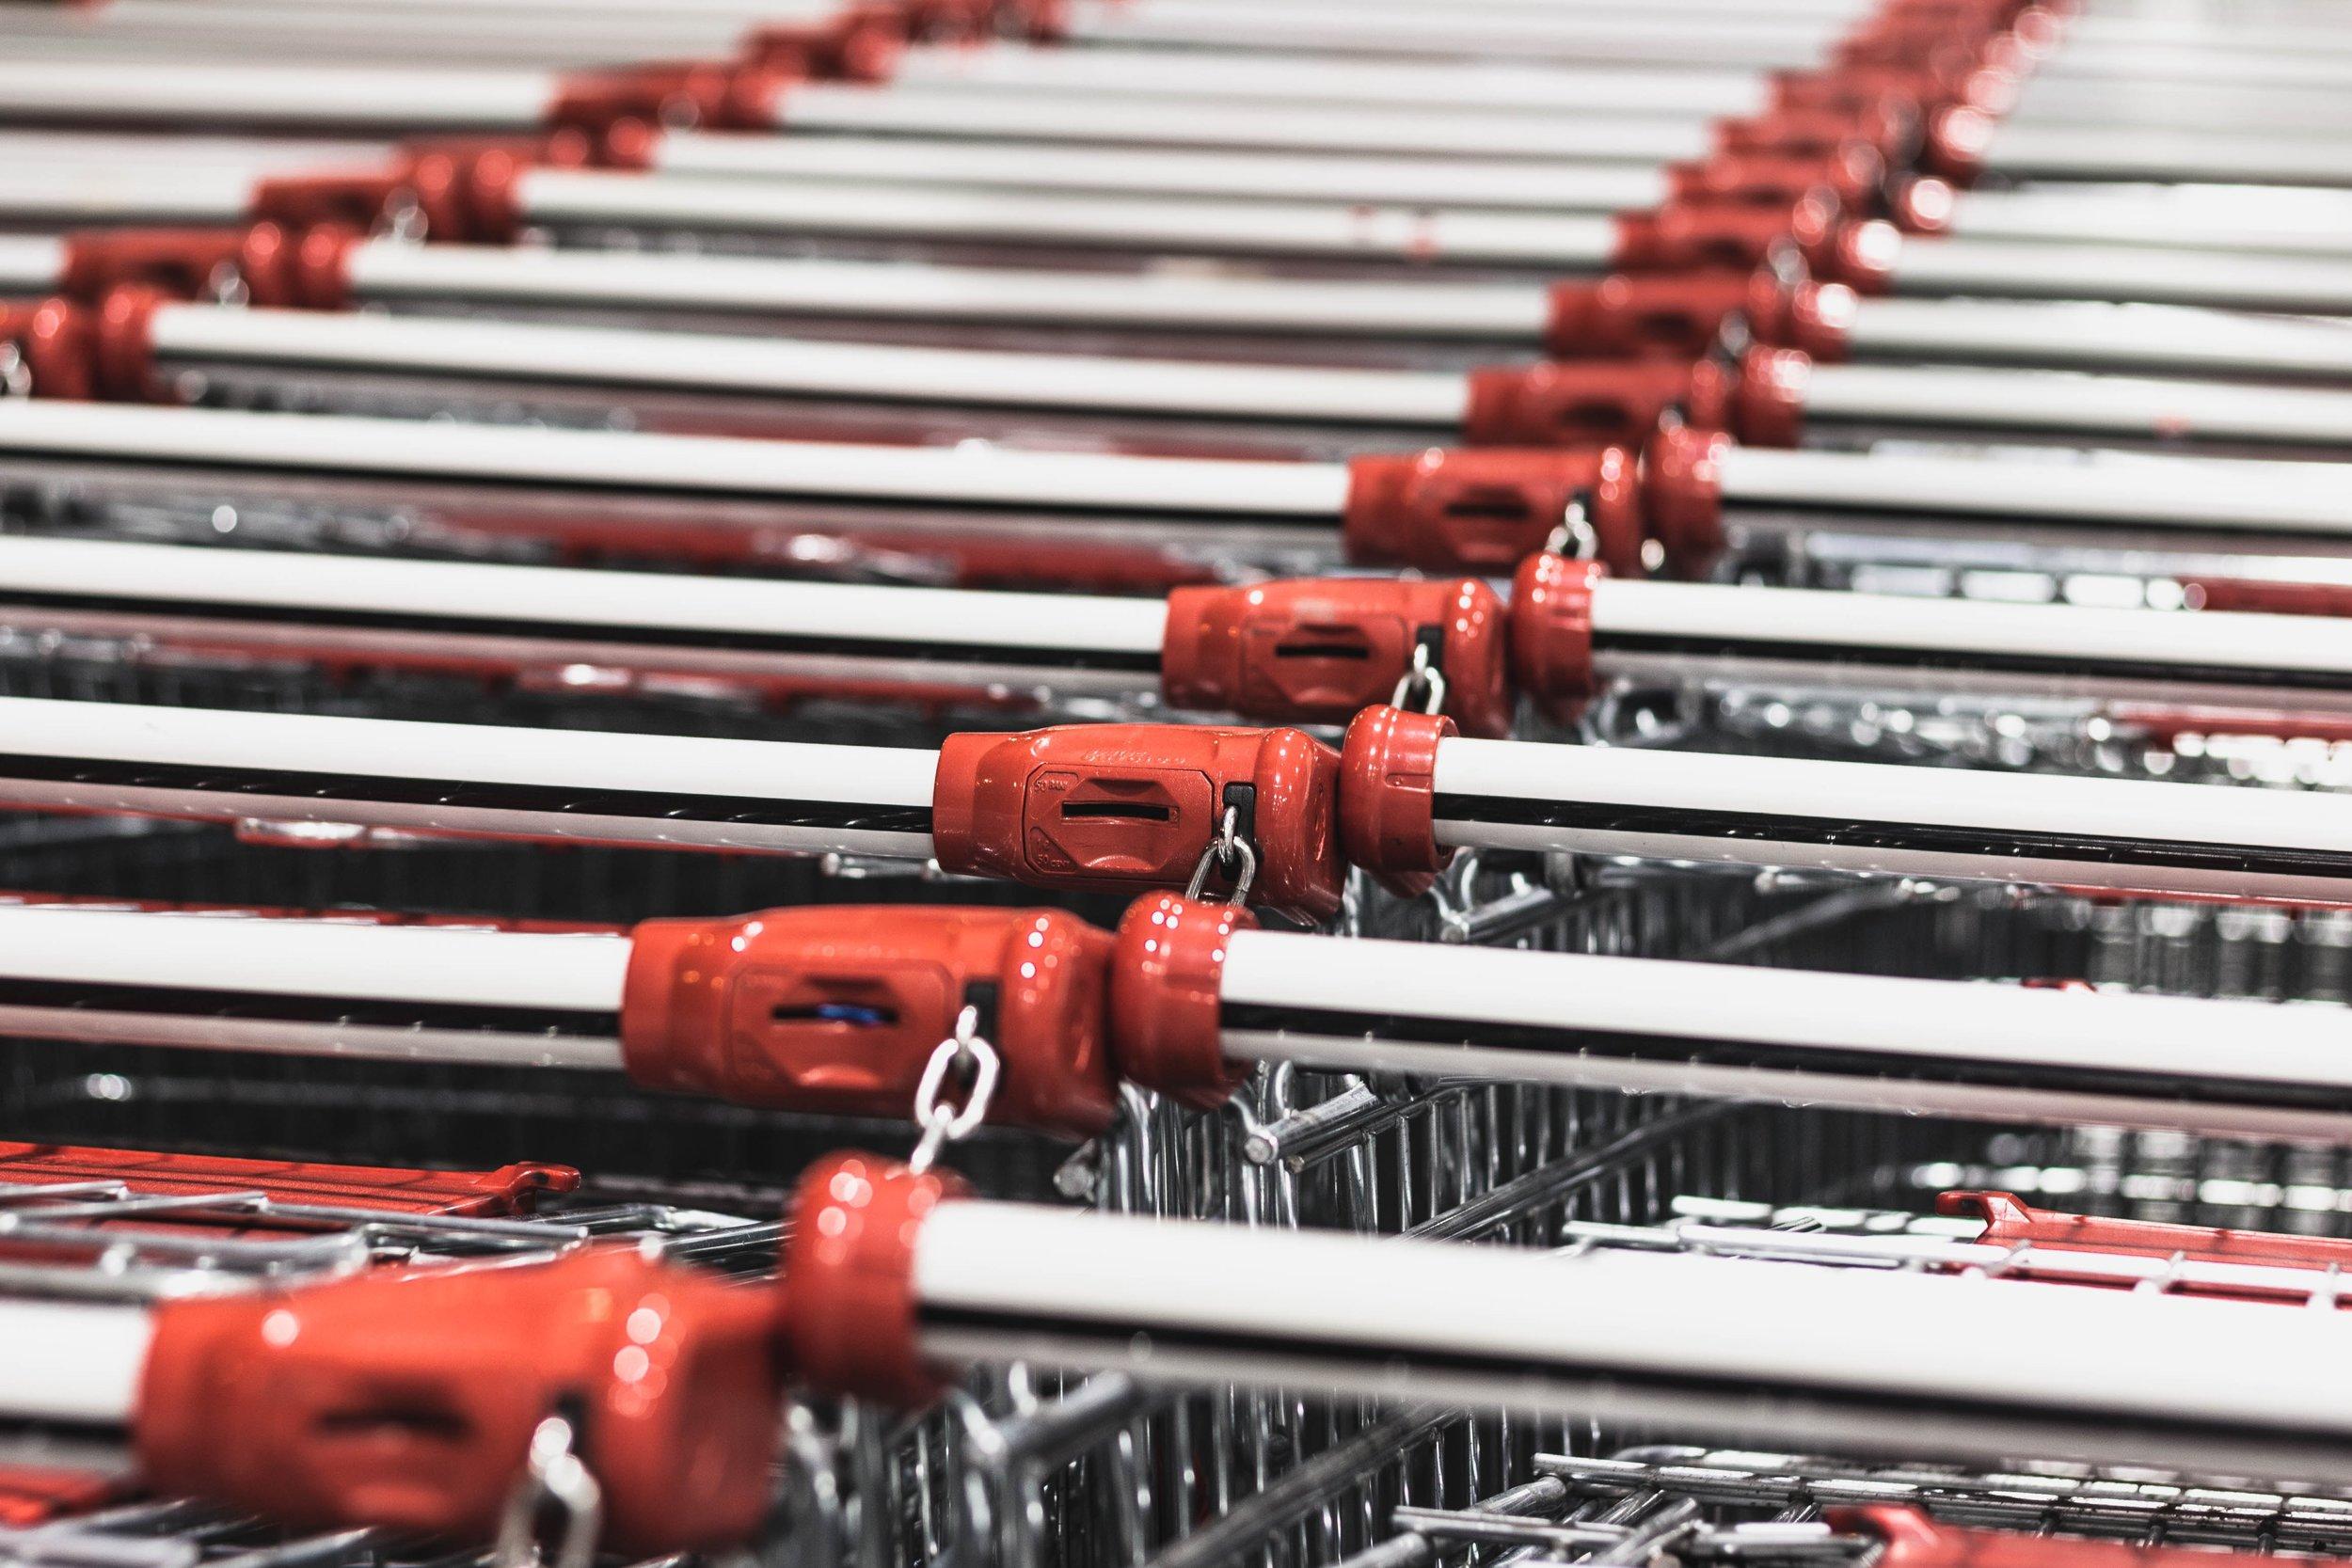 shopping import products importacion productos españa spain consumidores españoles.jpg